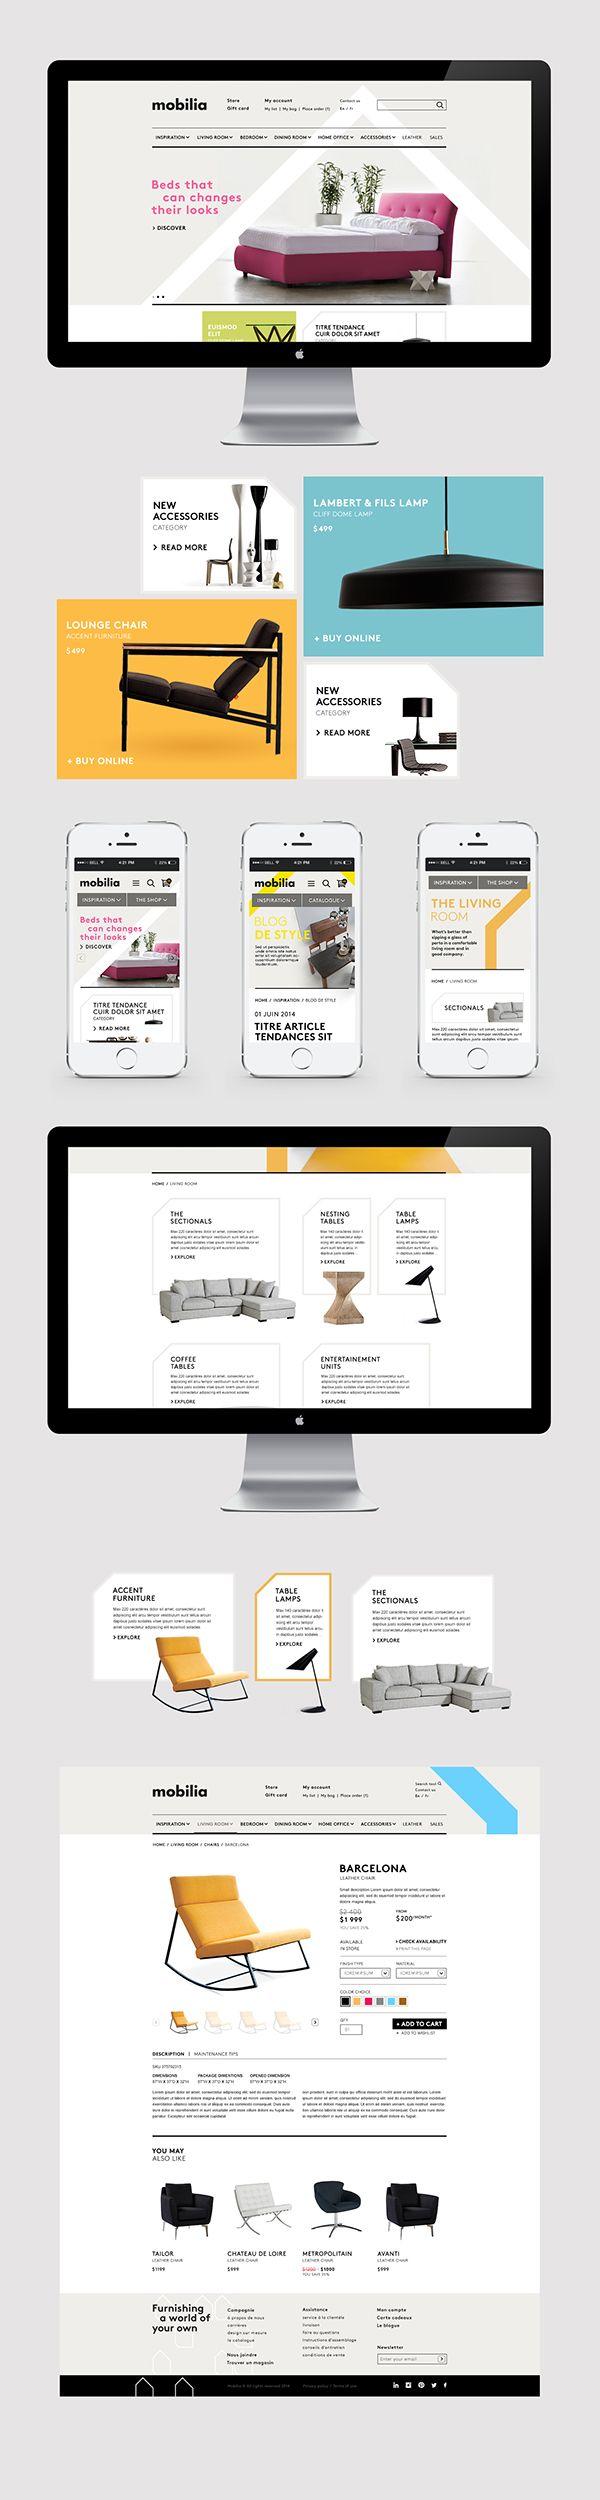 Mobilia Webdesign By Vanessa Pepin Via Behance Web Design Interactive Design Web Design Inspiration